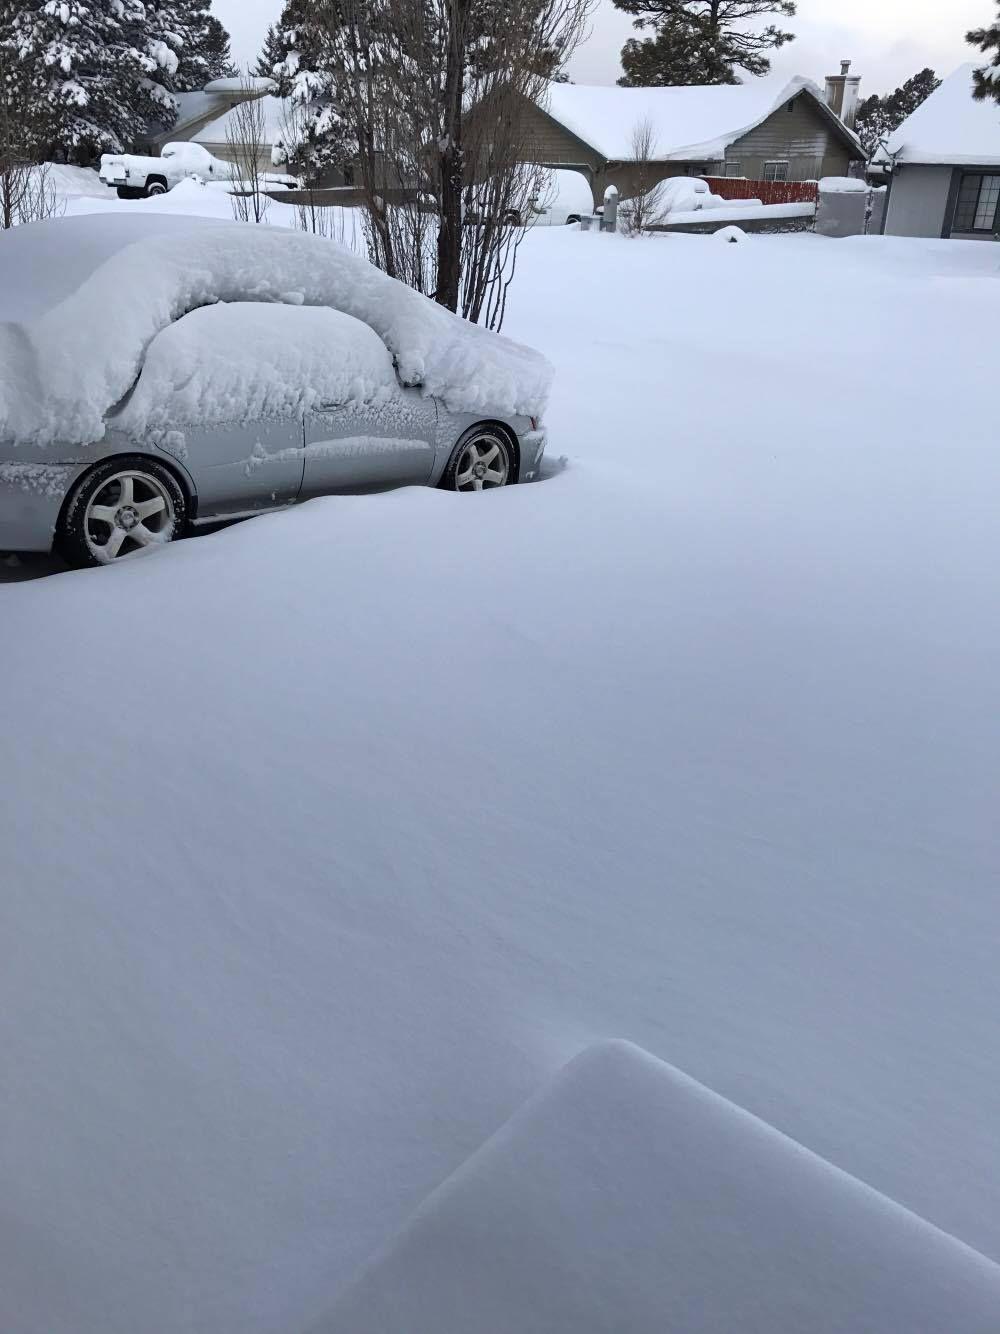 city winter parking regulations go into effect nov 1 local